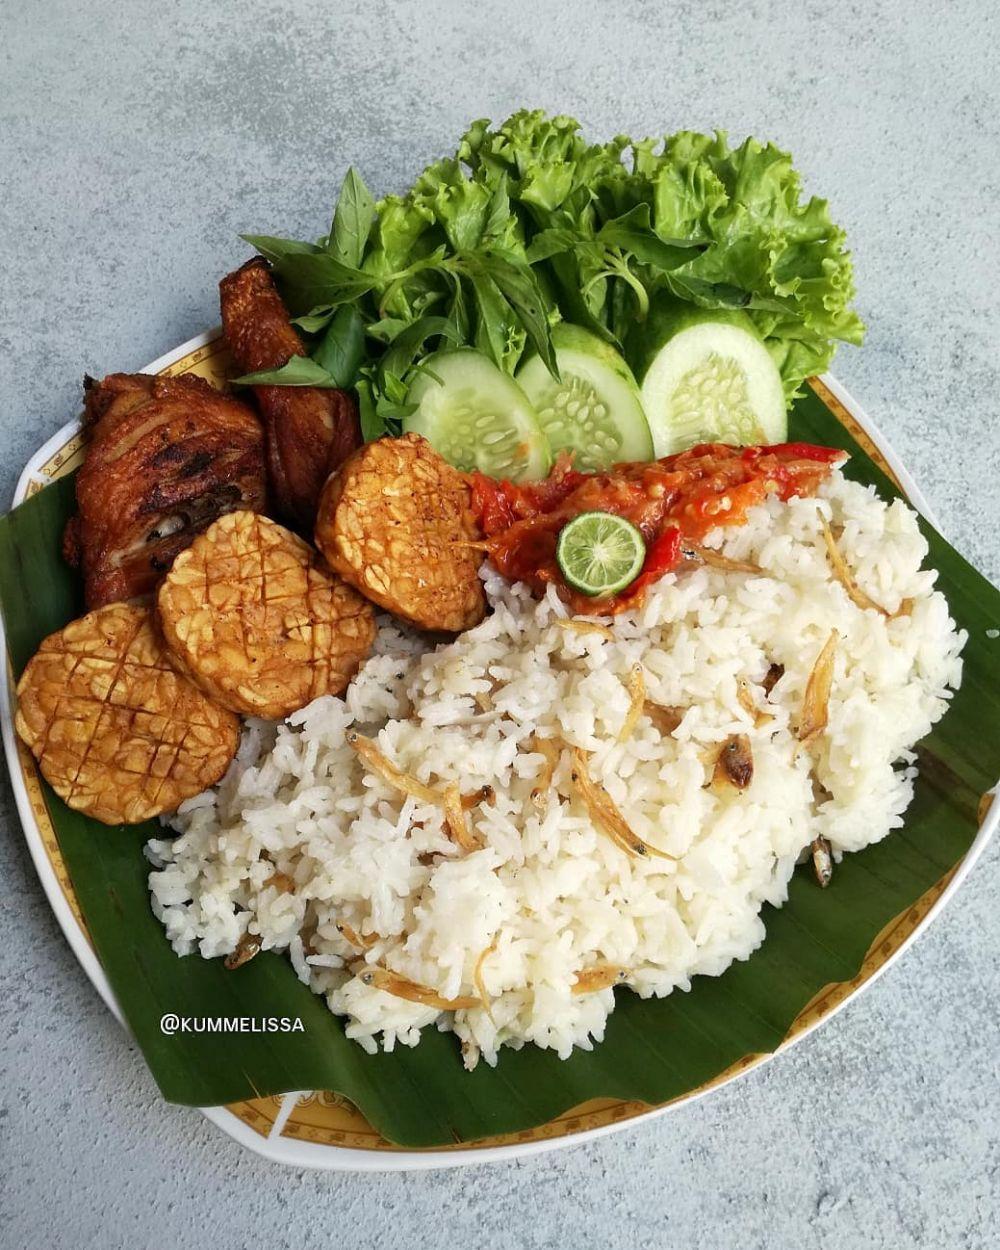 Resep kreasi nasi © 2020 brilio.net